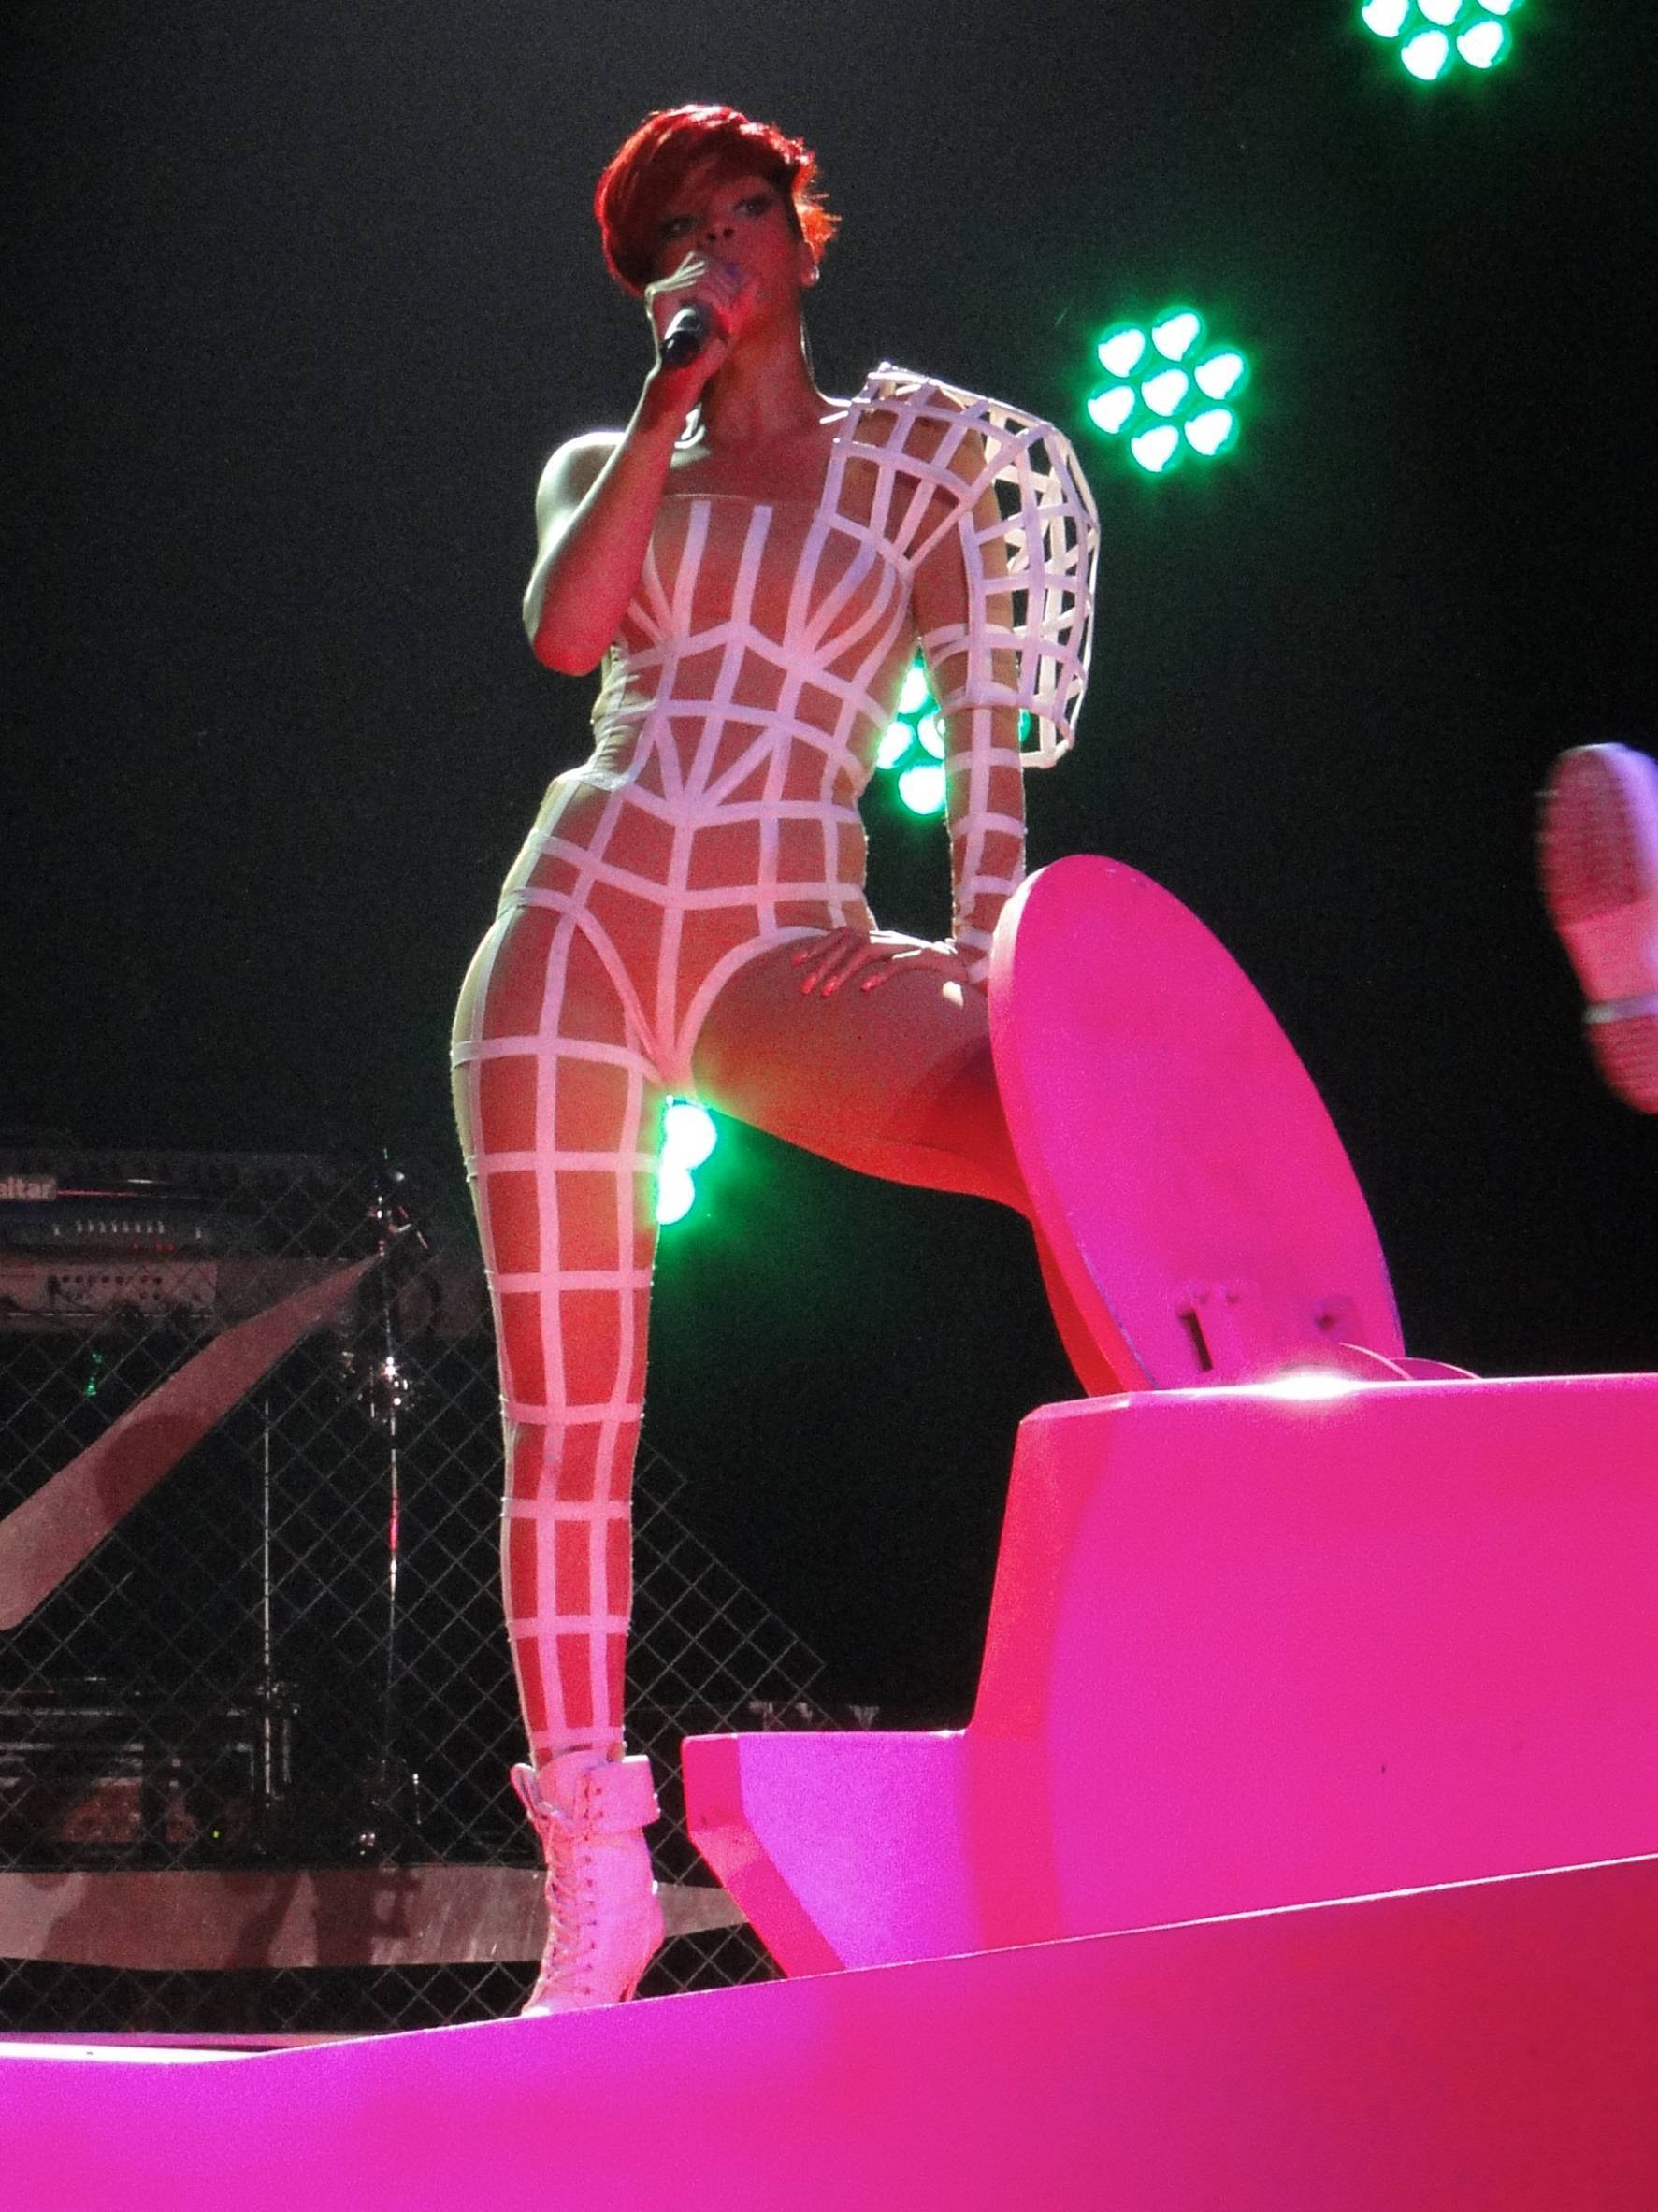 60957_RihannaperformsliveinSacramento.com_TheElder_Rihanna2010_07_09_performsliveinSacramento13_122_77lo.jpg